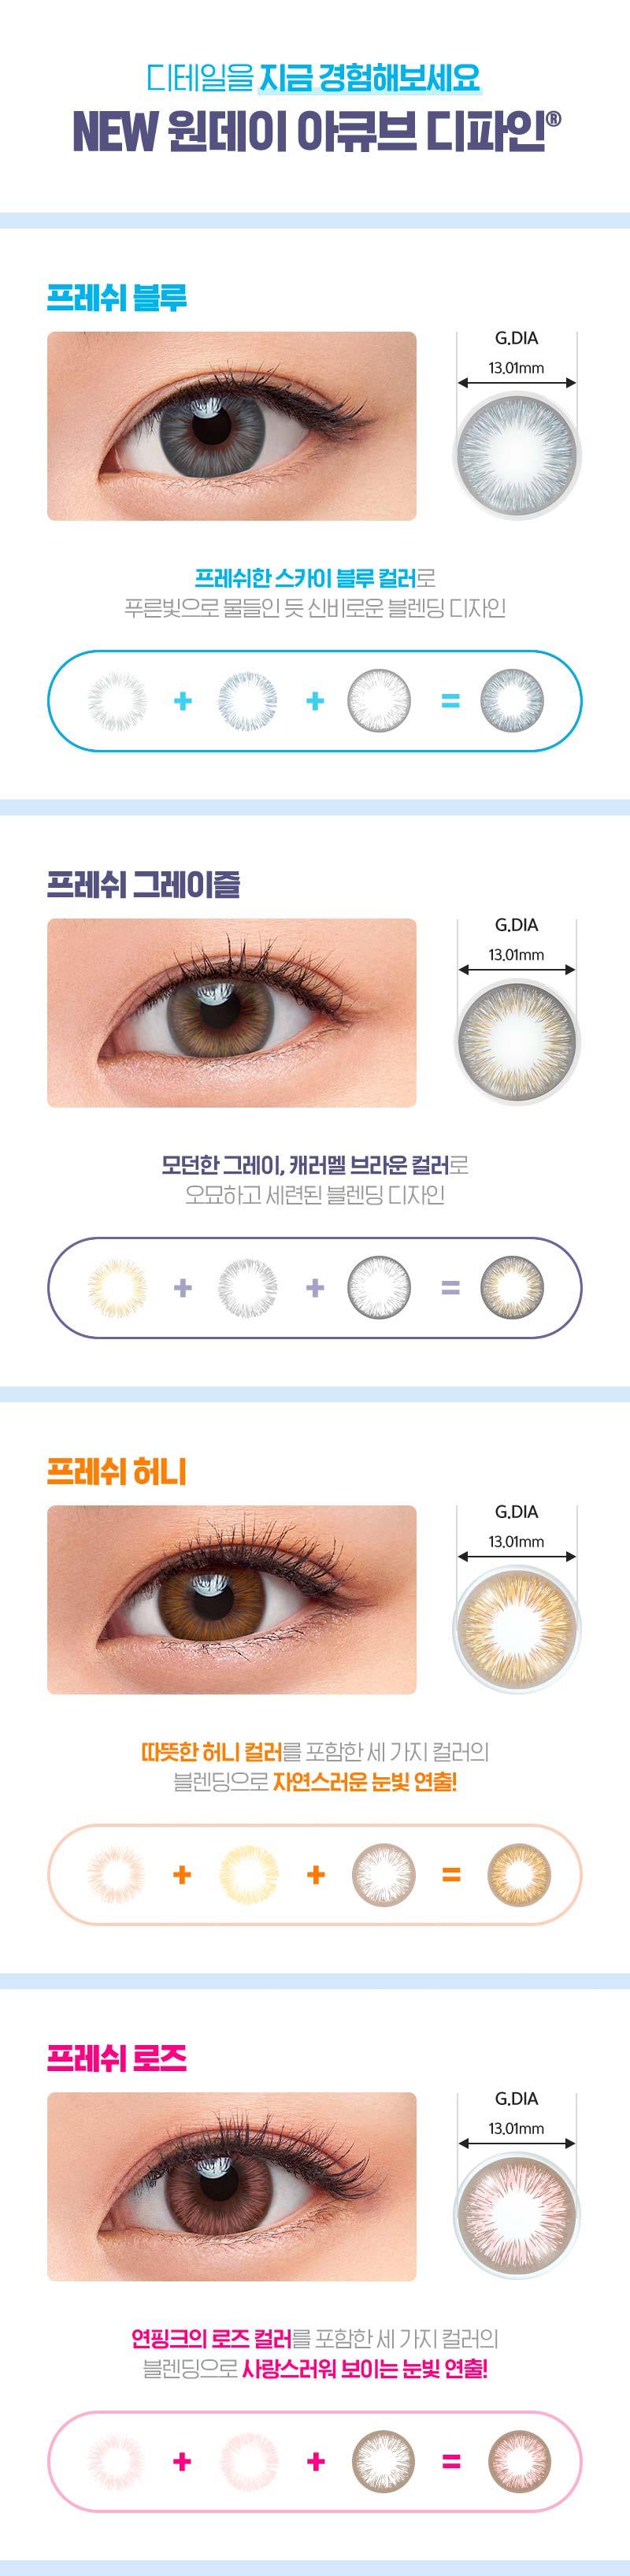 acuvue-colored-lenses2.jpg